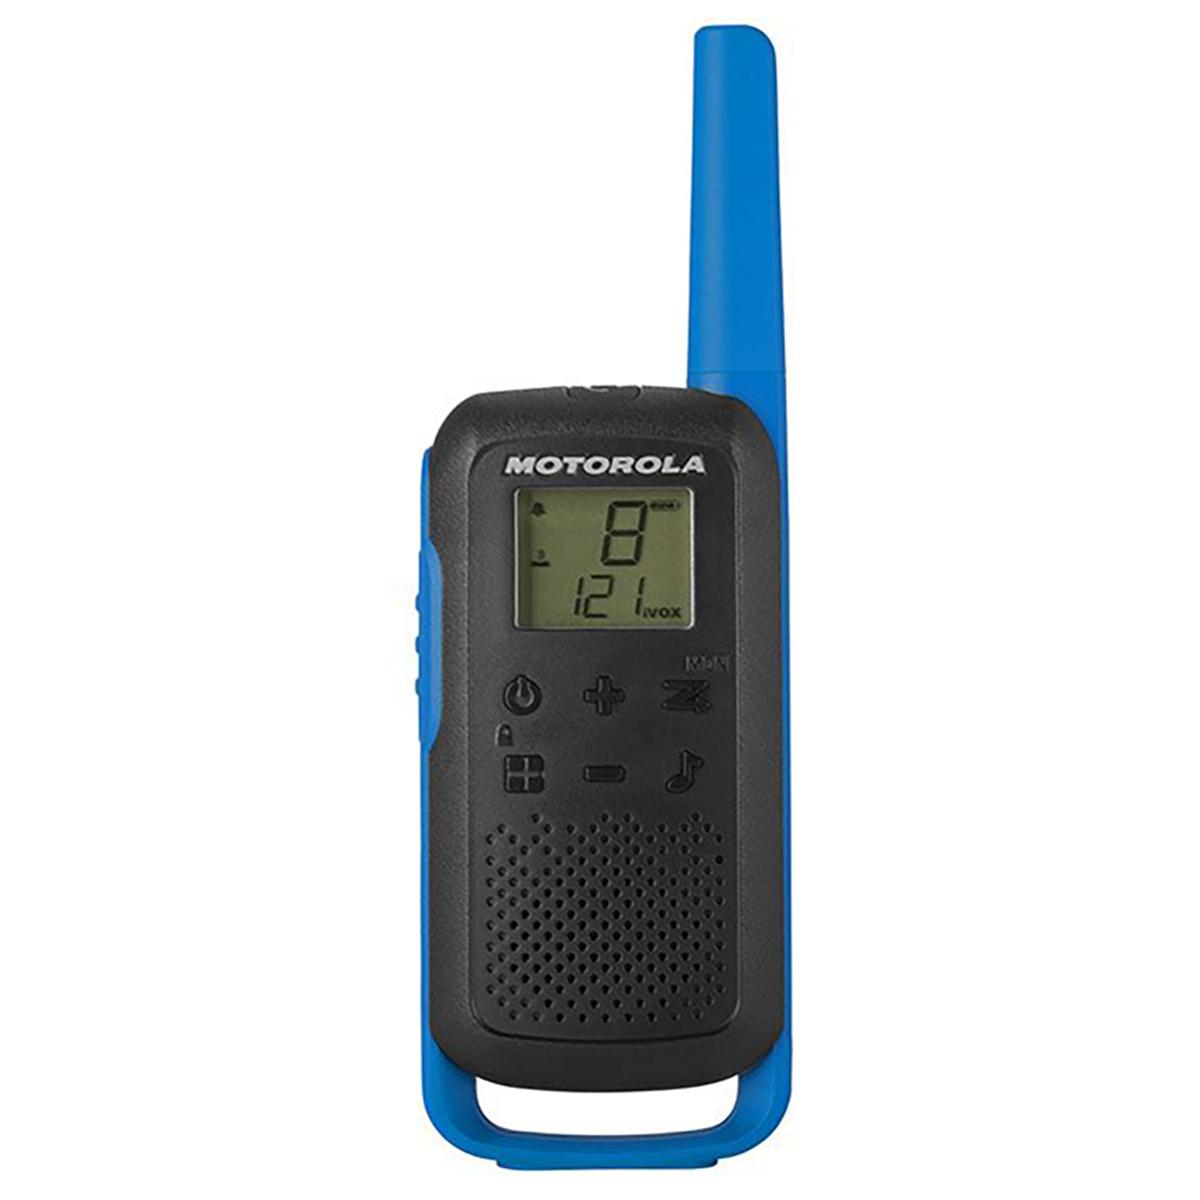 Motorola TLKR T62 Walkie-Talkie Radios TWIN Pack Blue